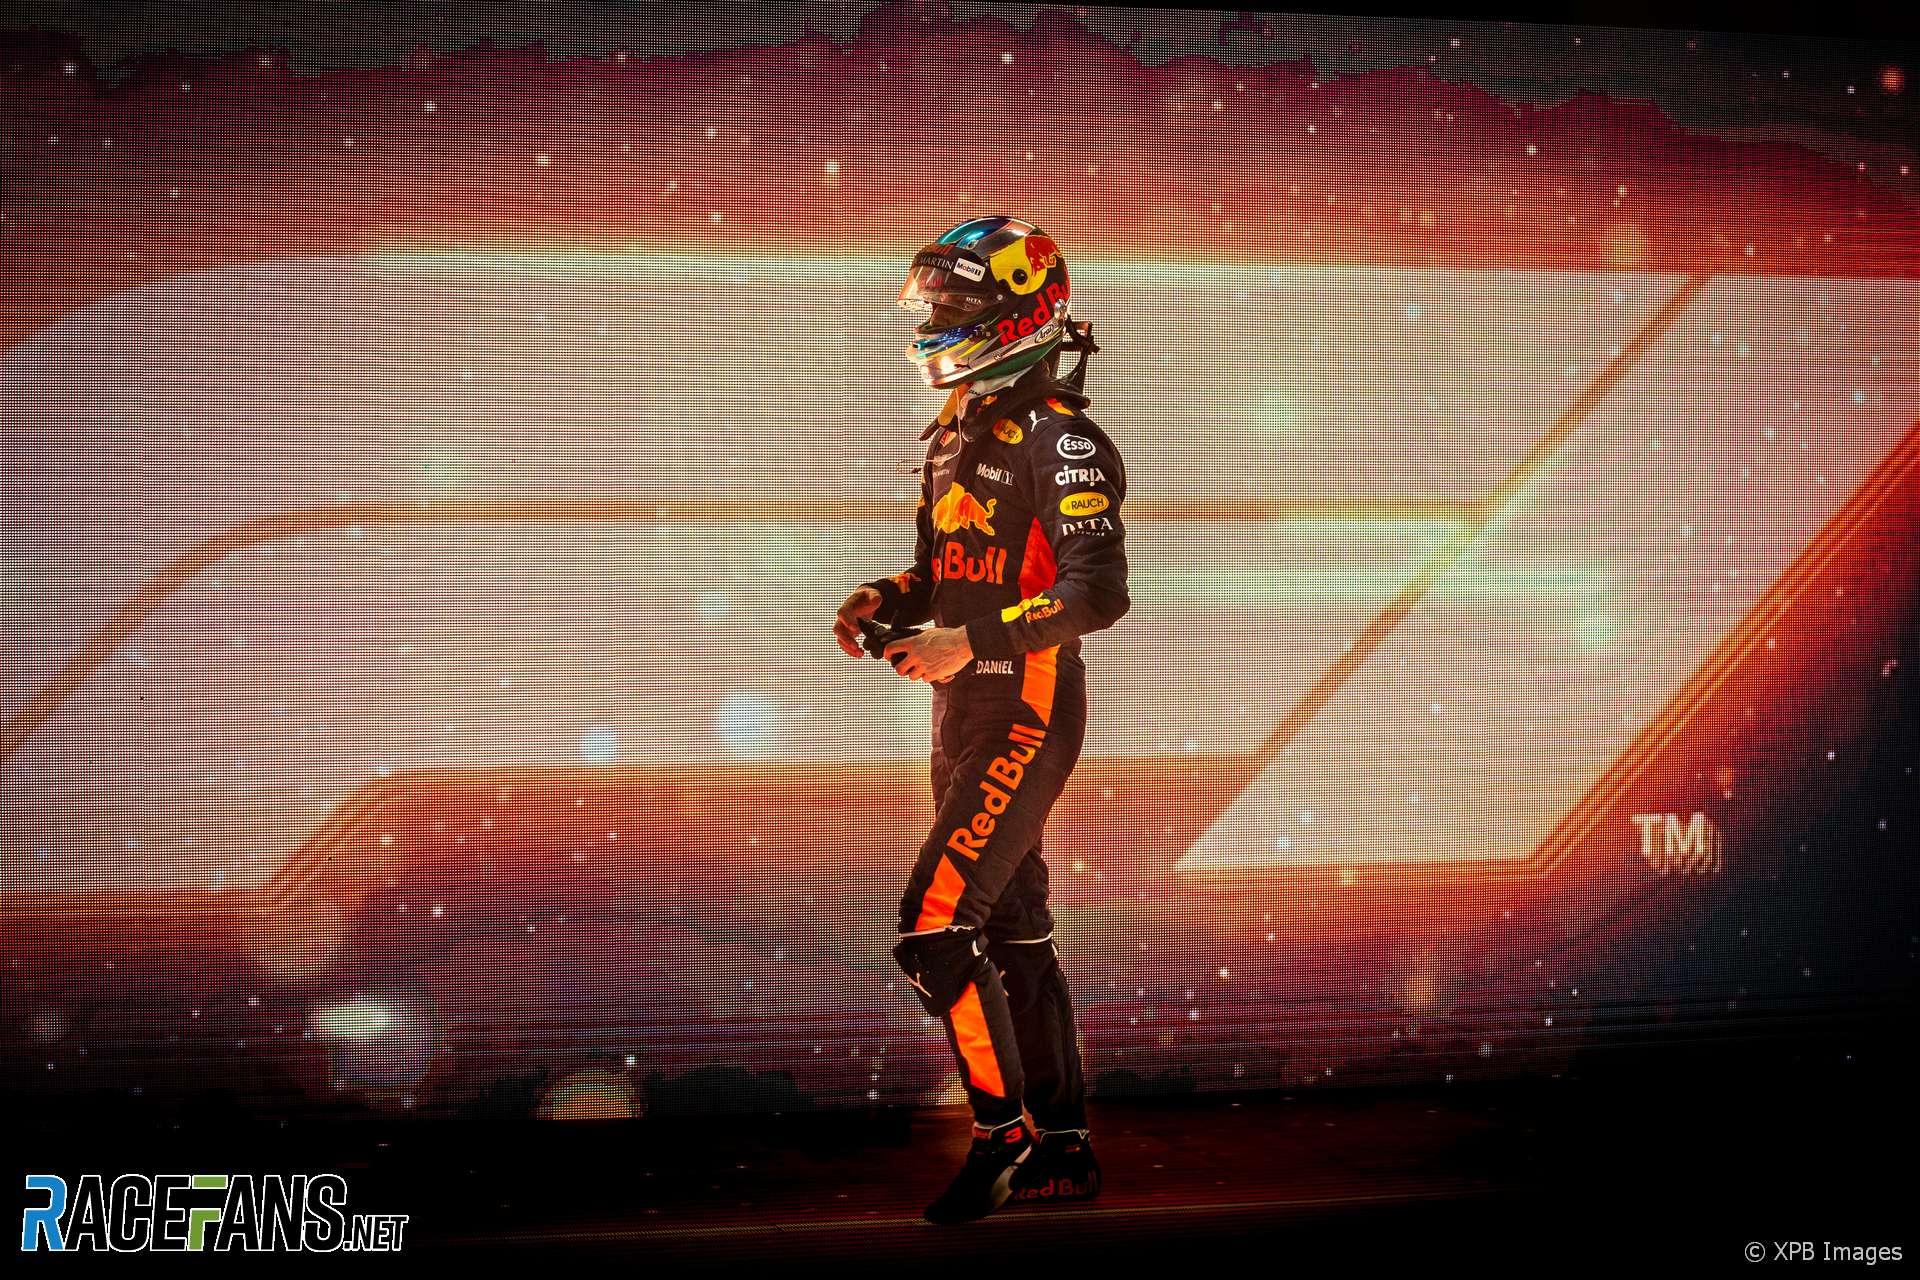 Daniel Ricciardo, Red Bull, Yas Marina, 2018